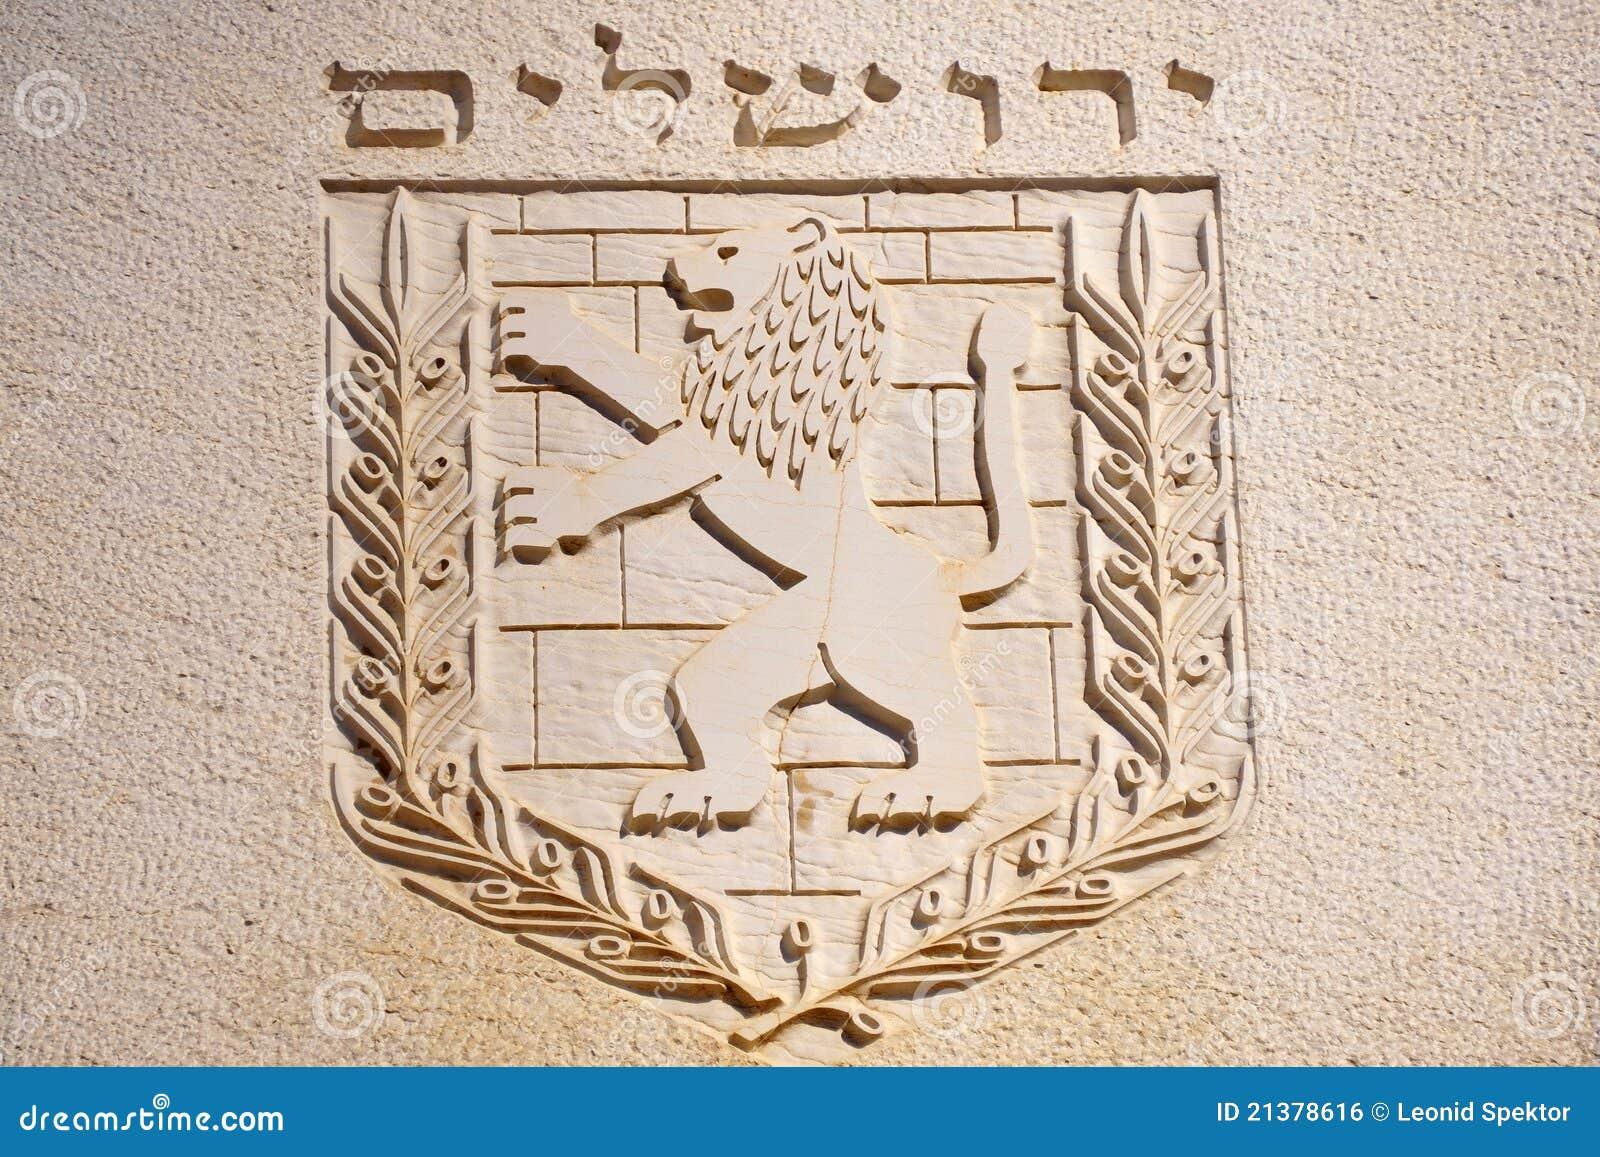 Emblem Of Jerusalem City Royalty Free Stock Image Image